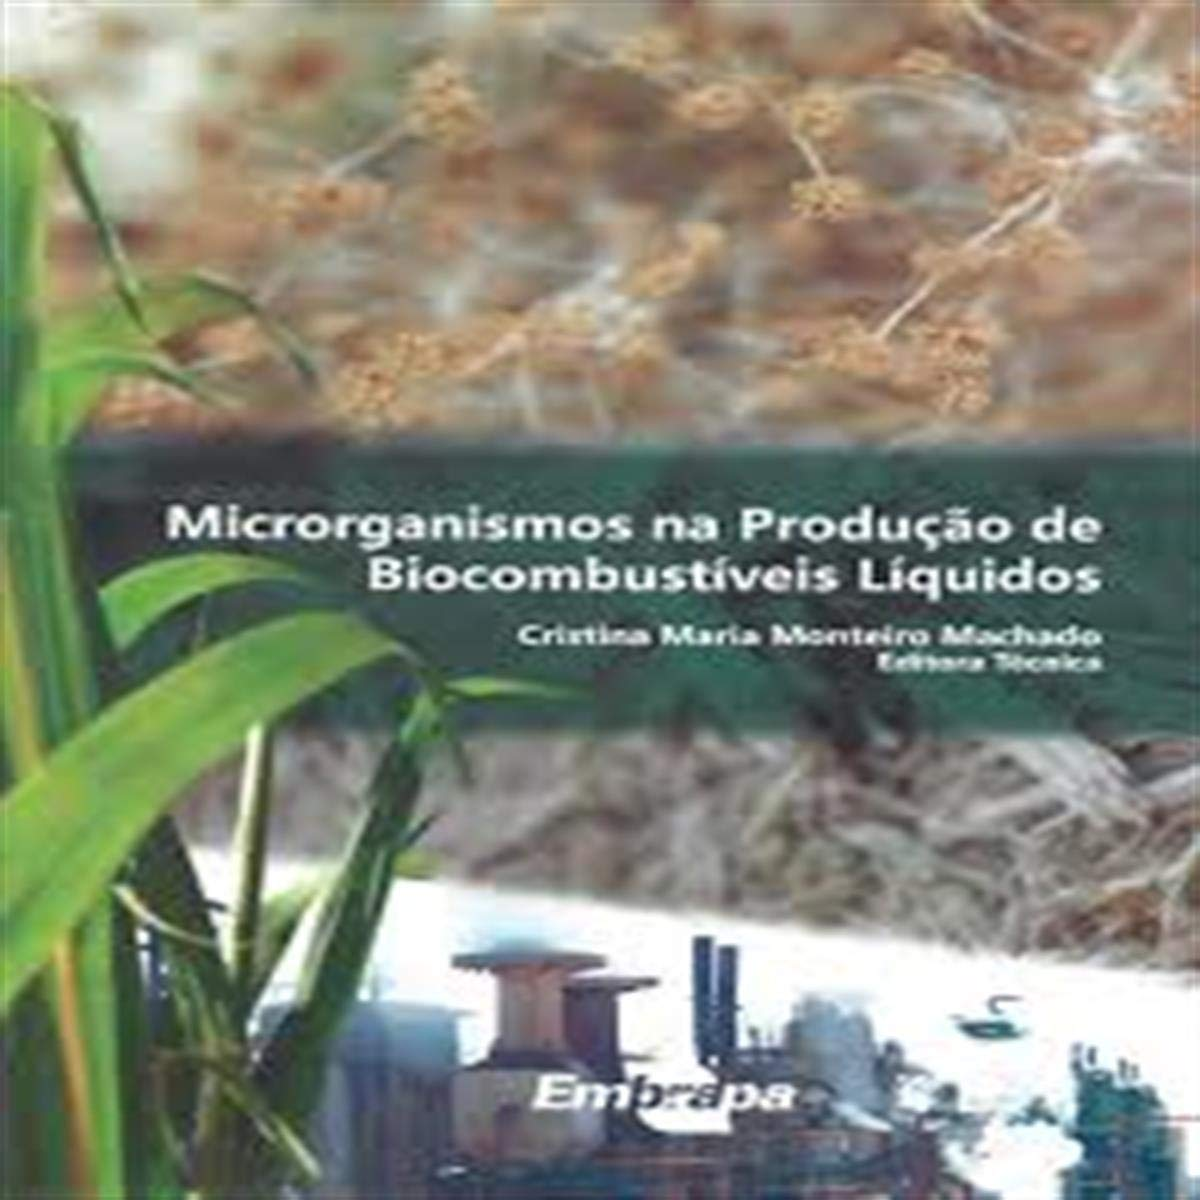 Microorganismos na Producao de Biocombustiveis Liquidos ...